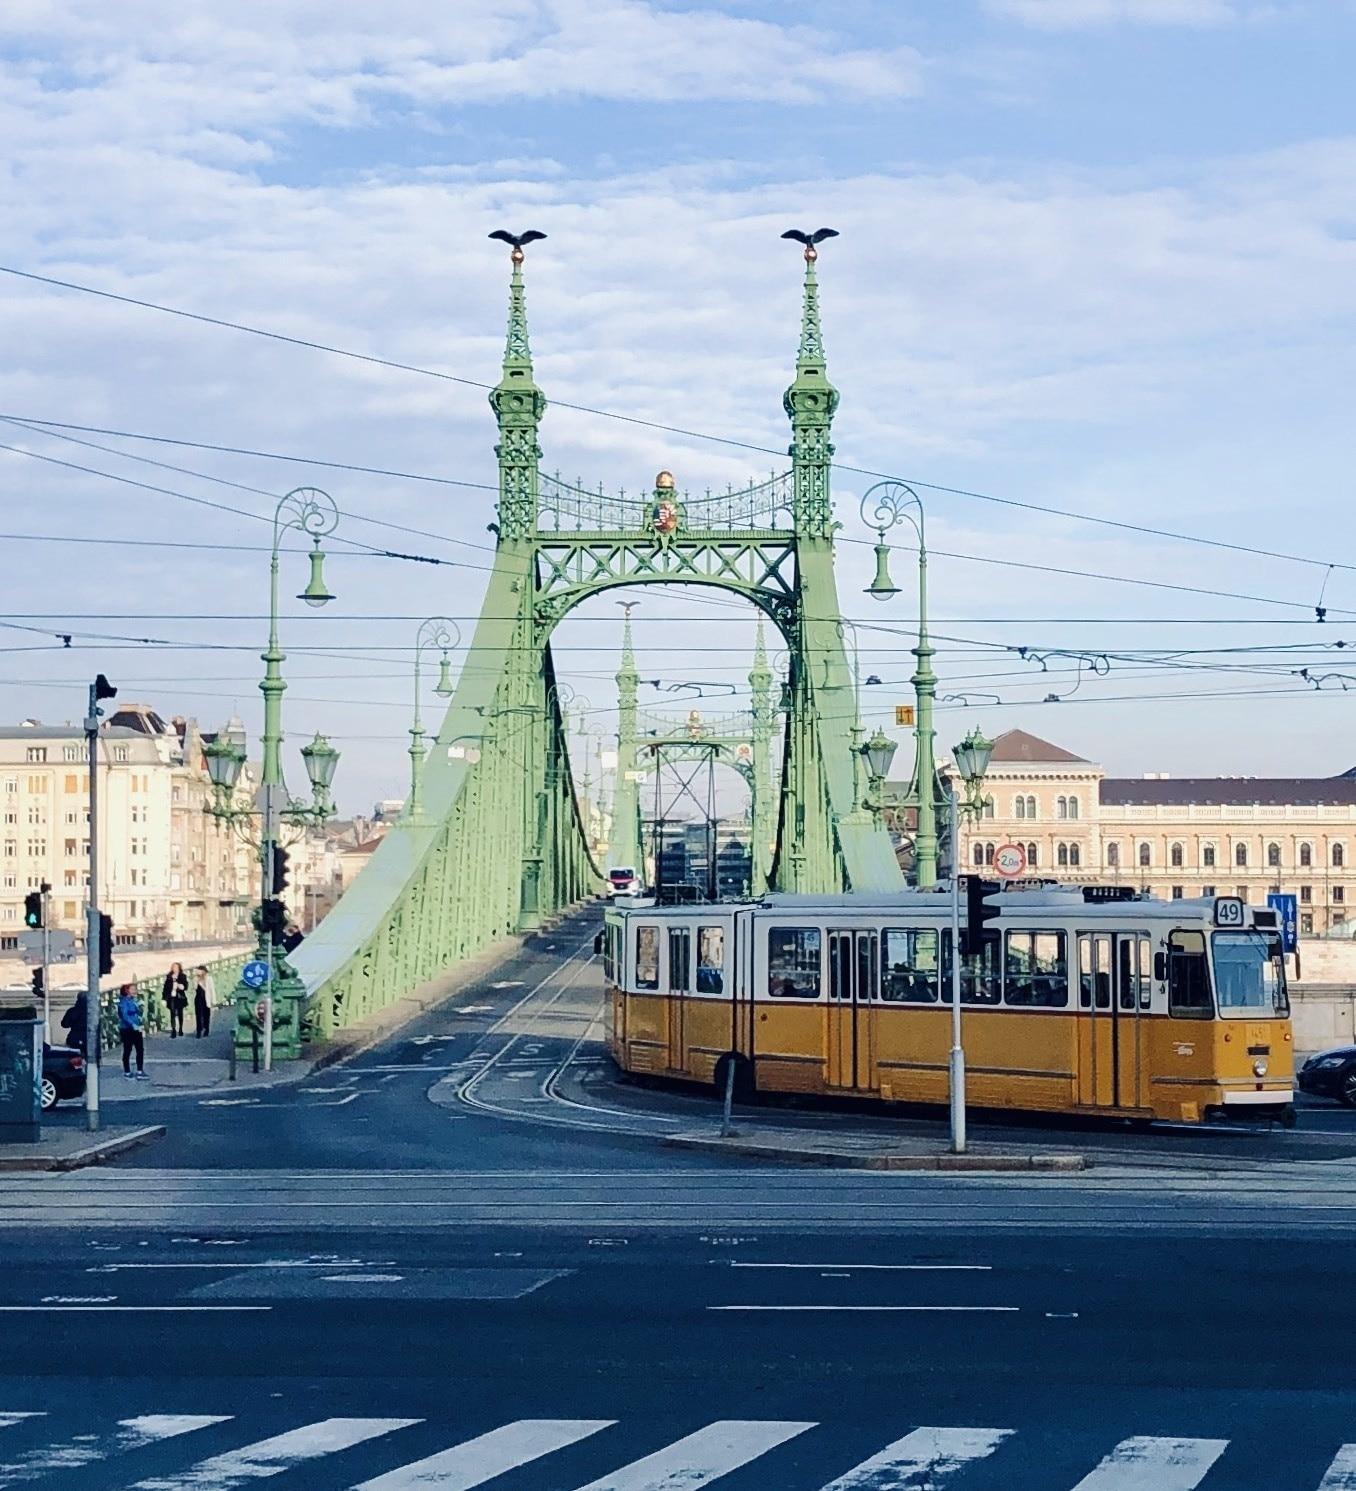 Lágymányos, Budapest, Hungary